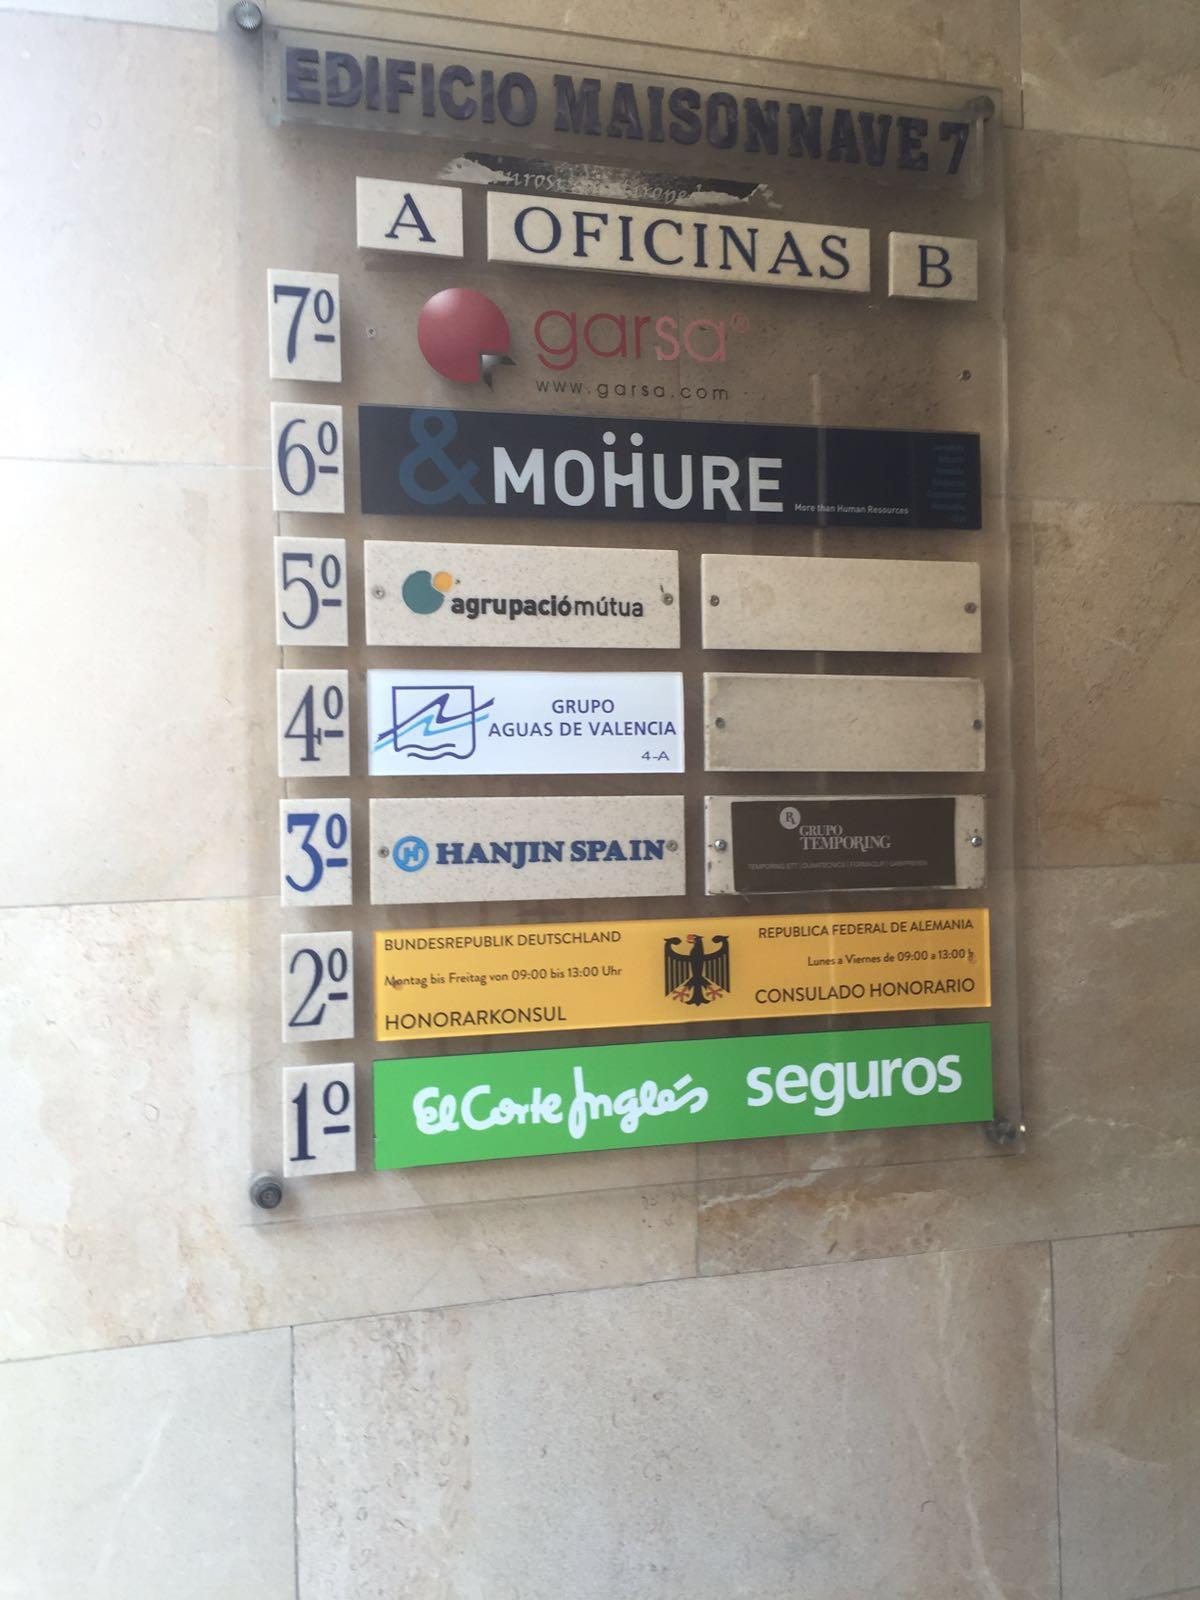 Deutsche Konsulat Alicante